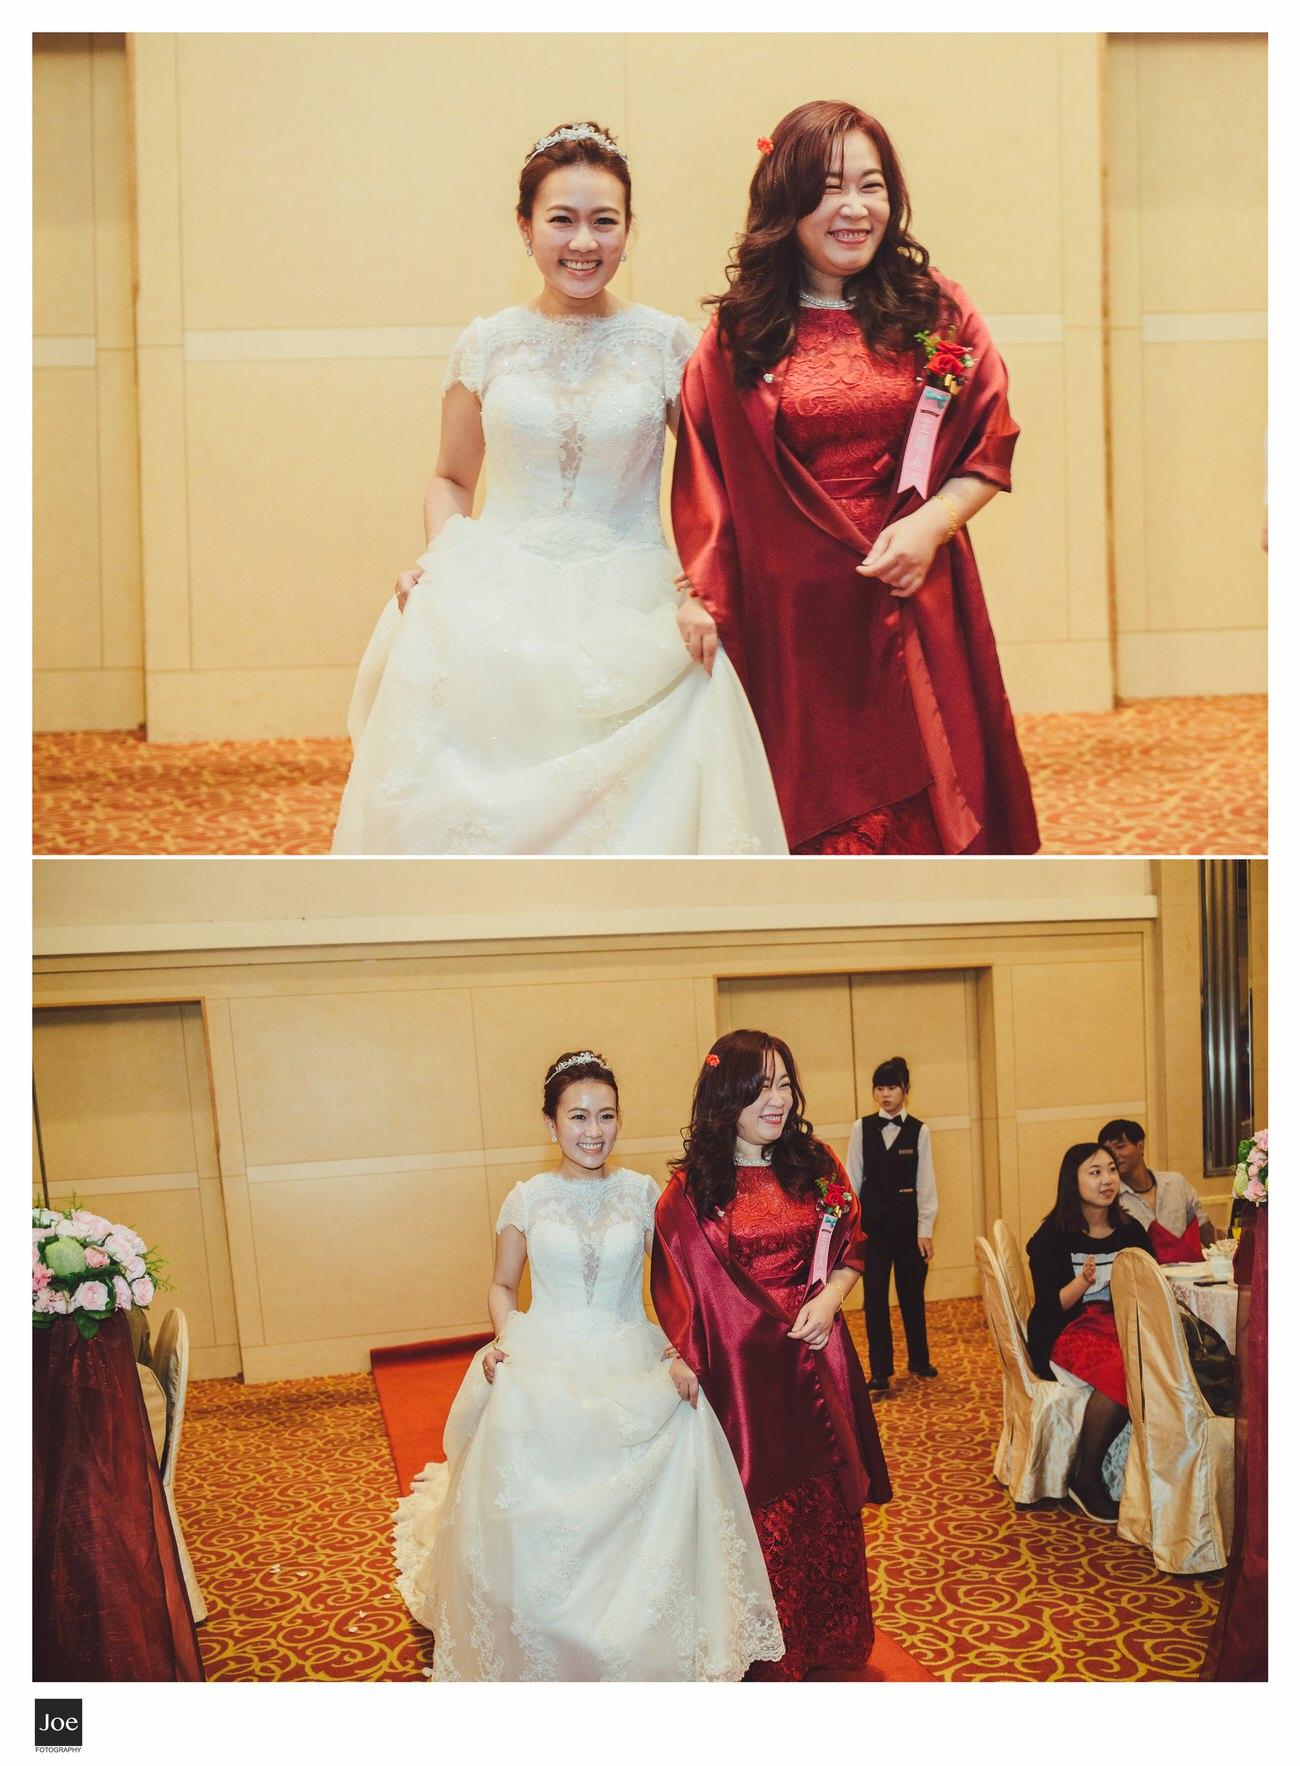 sunworld-dynasty-hotel-taipei-wedding-photo-joe-fotography-angel-jay-082.jpg